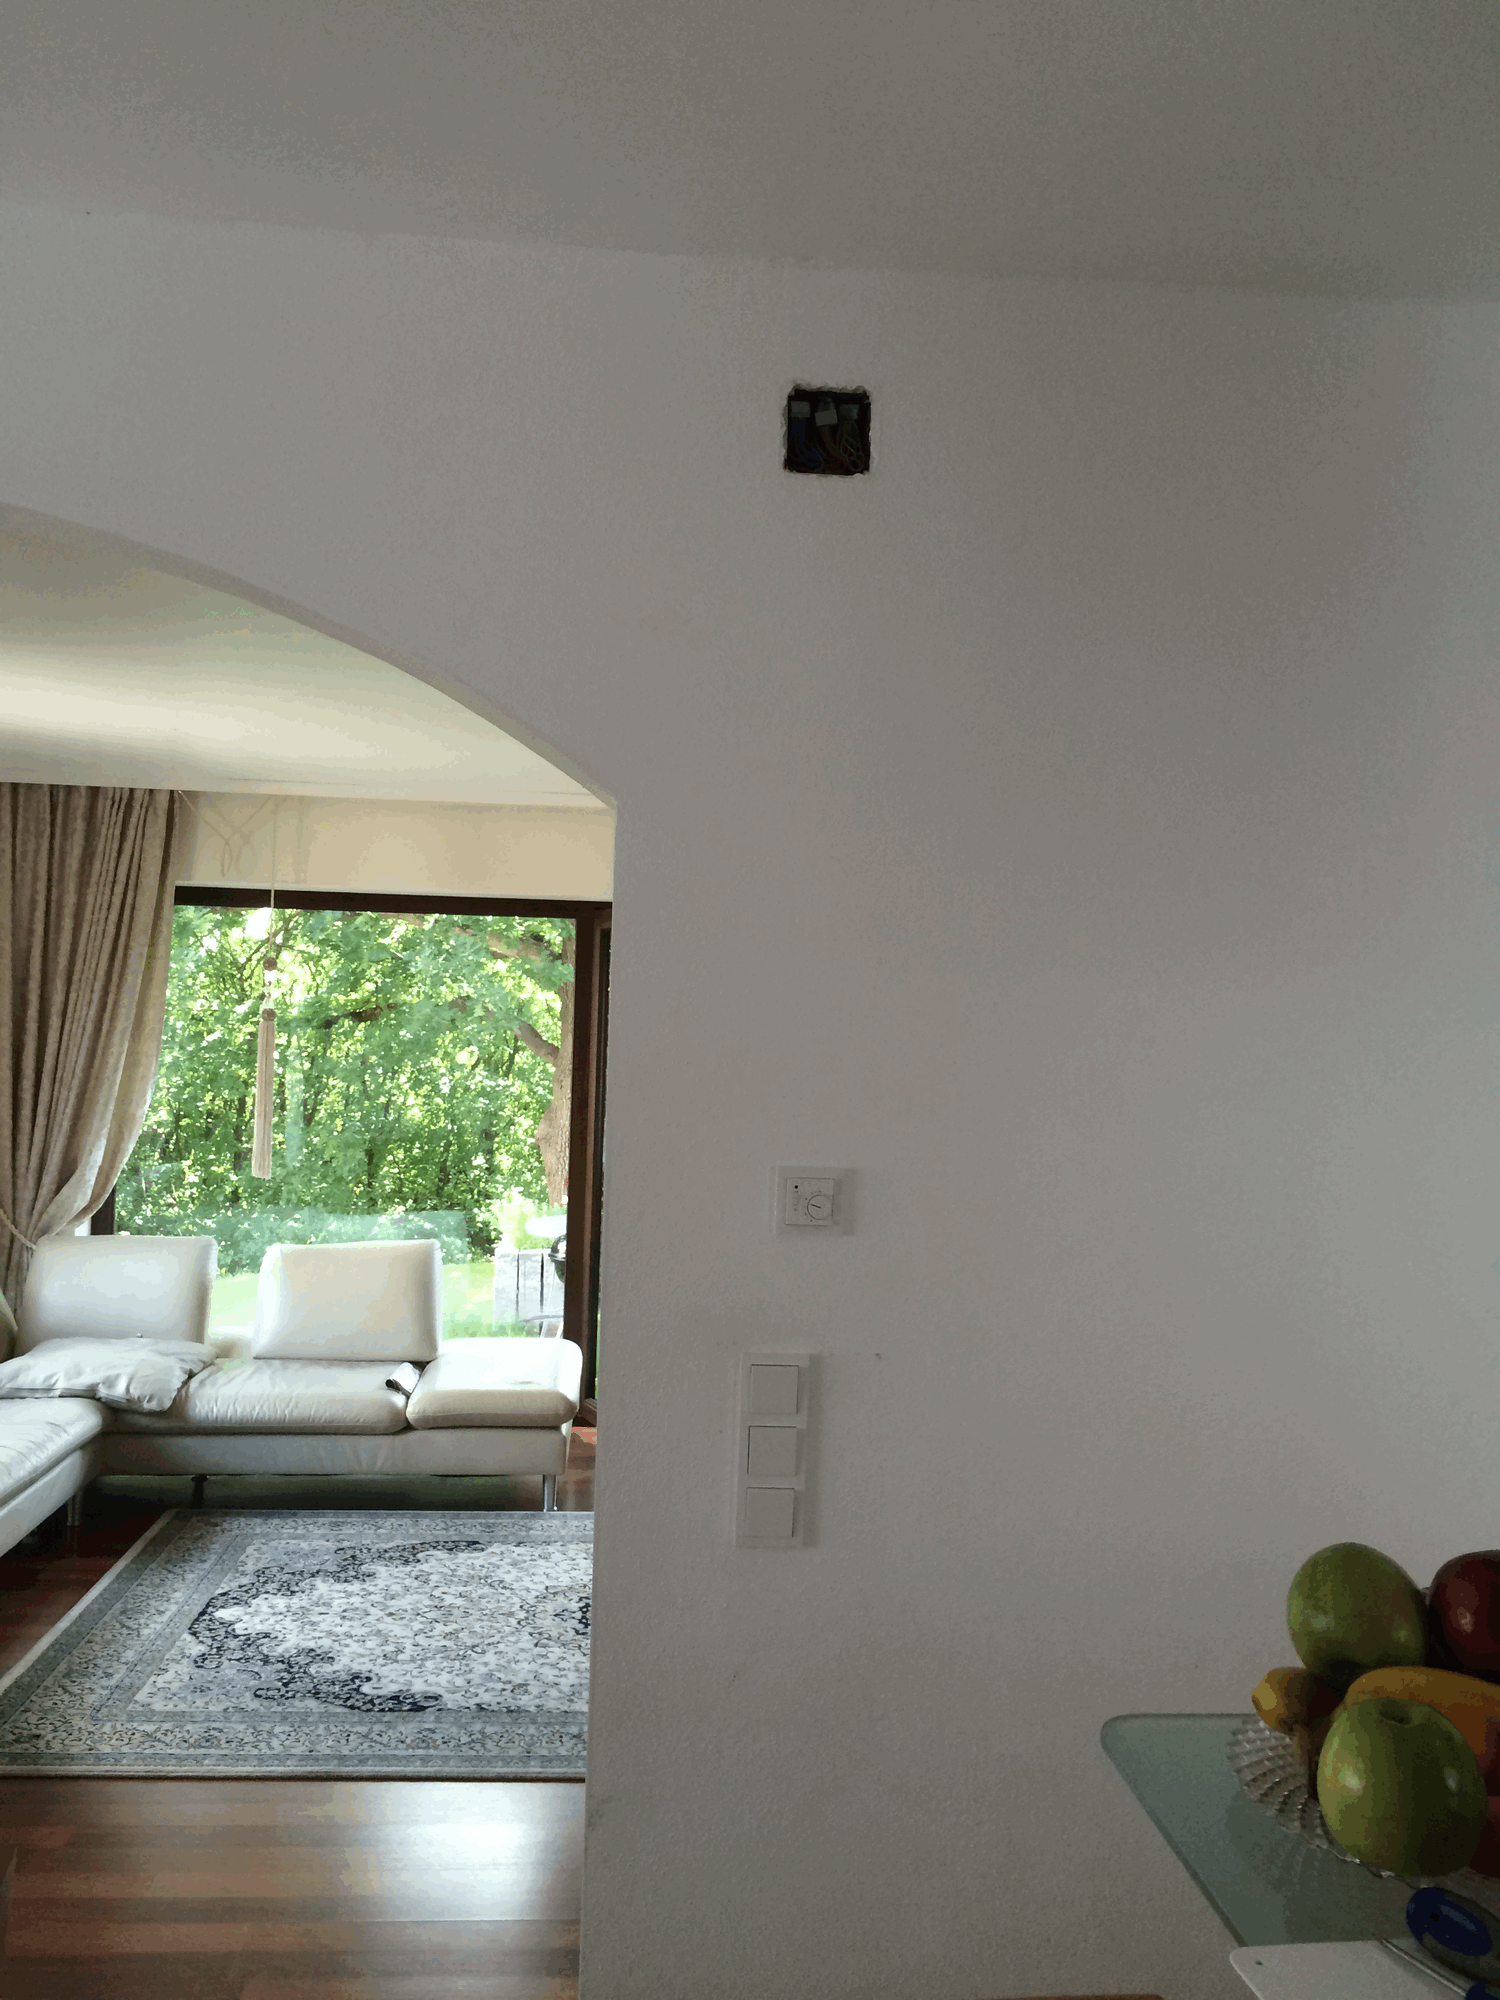 Hausbau Blog: Einfamilienhaus, Neubau in Massivbauweise